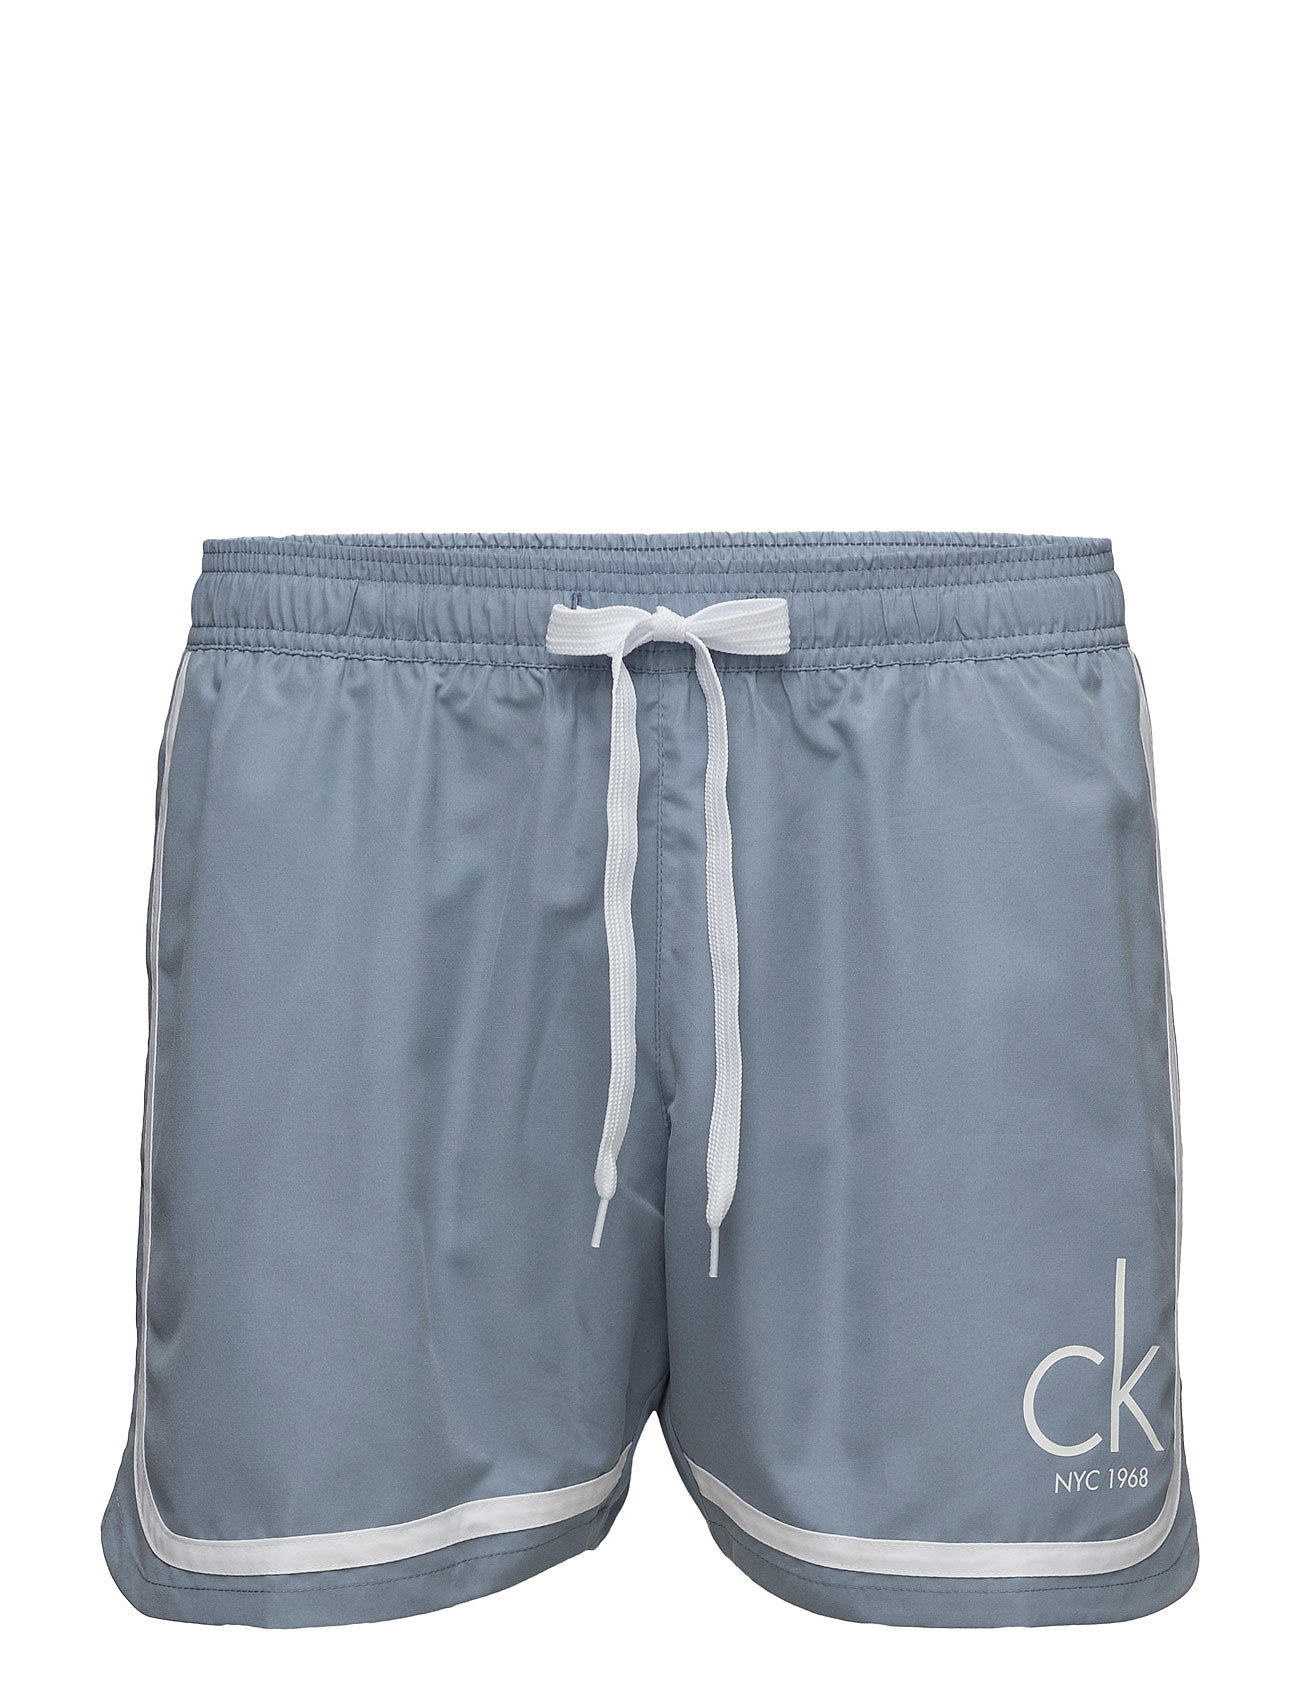 Retro Medium Drawstr Calvin Klein Shorts til Mænd i